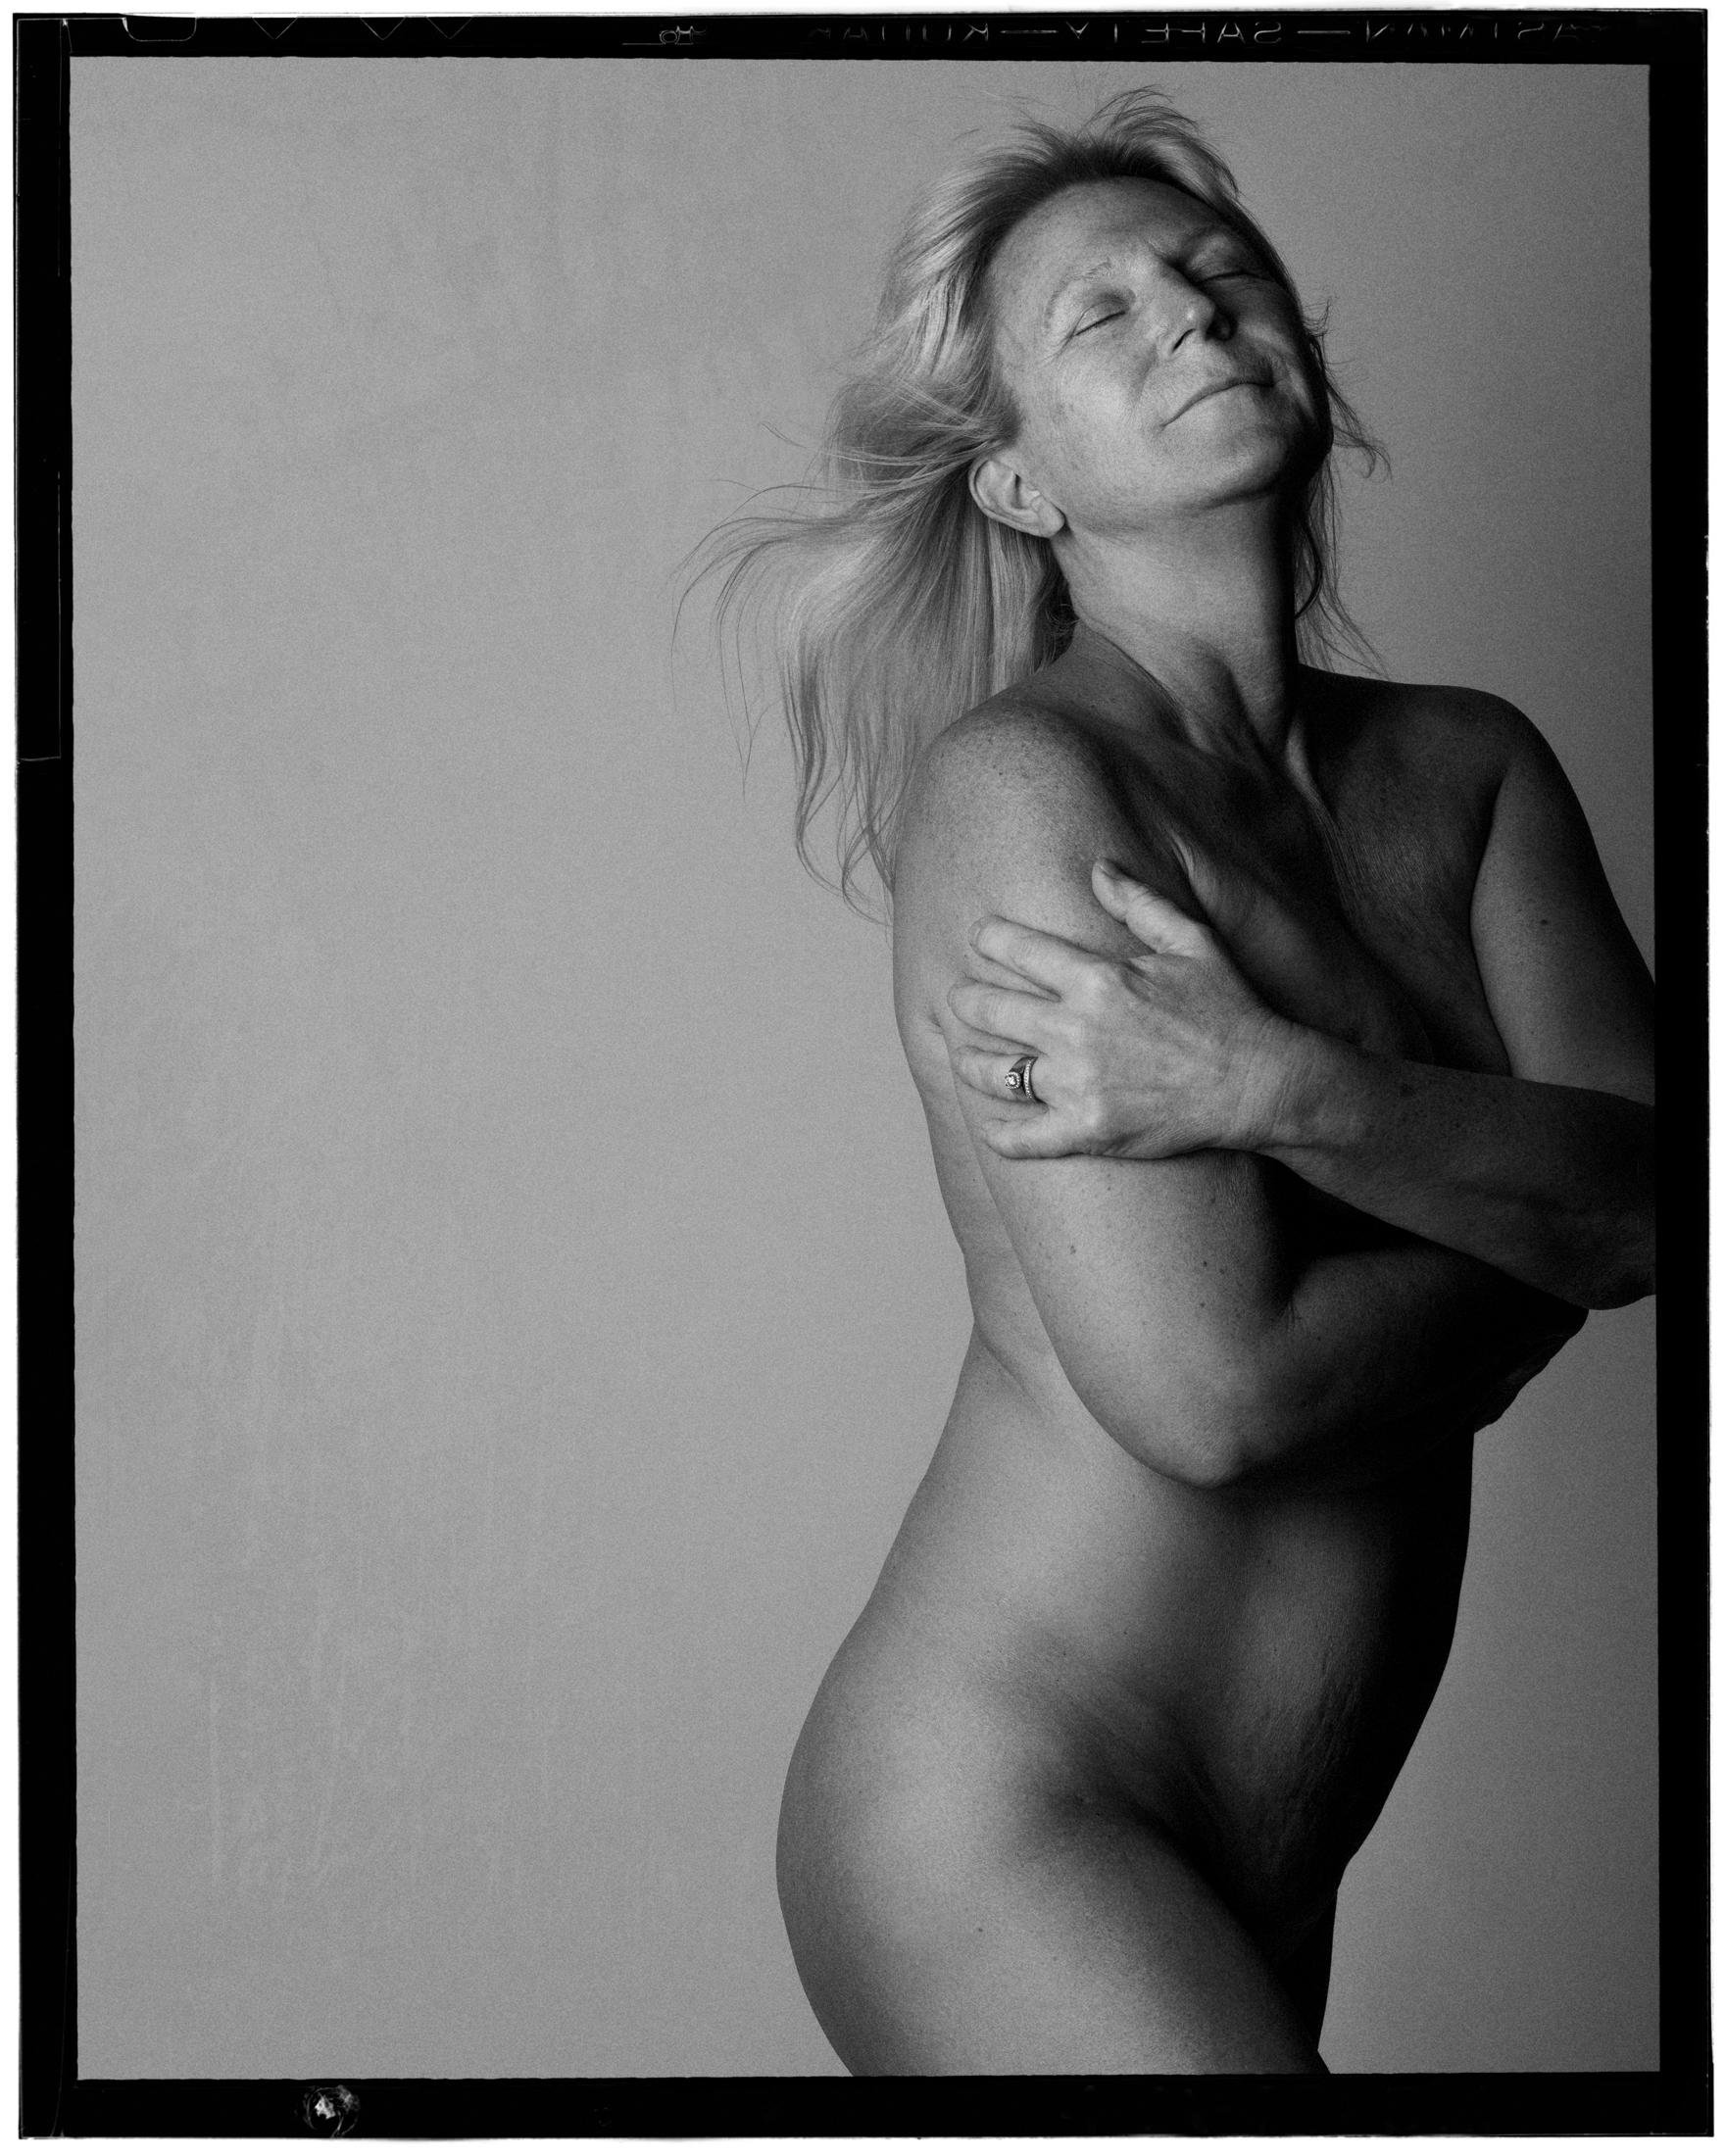 wildwomanproject_karamariestudios1.jpg